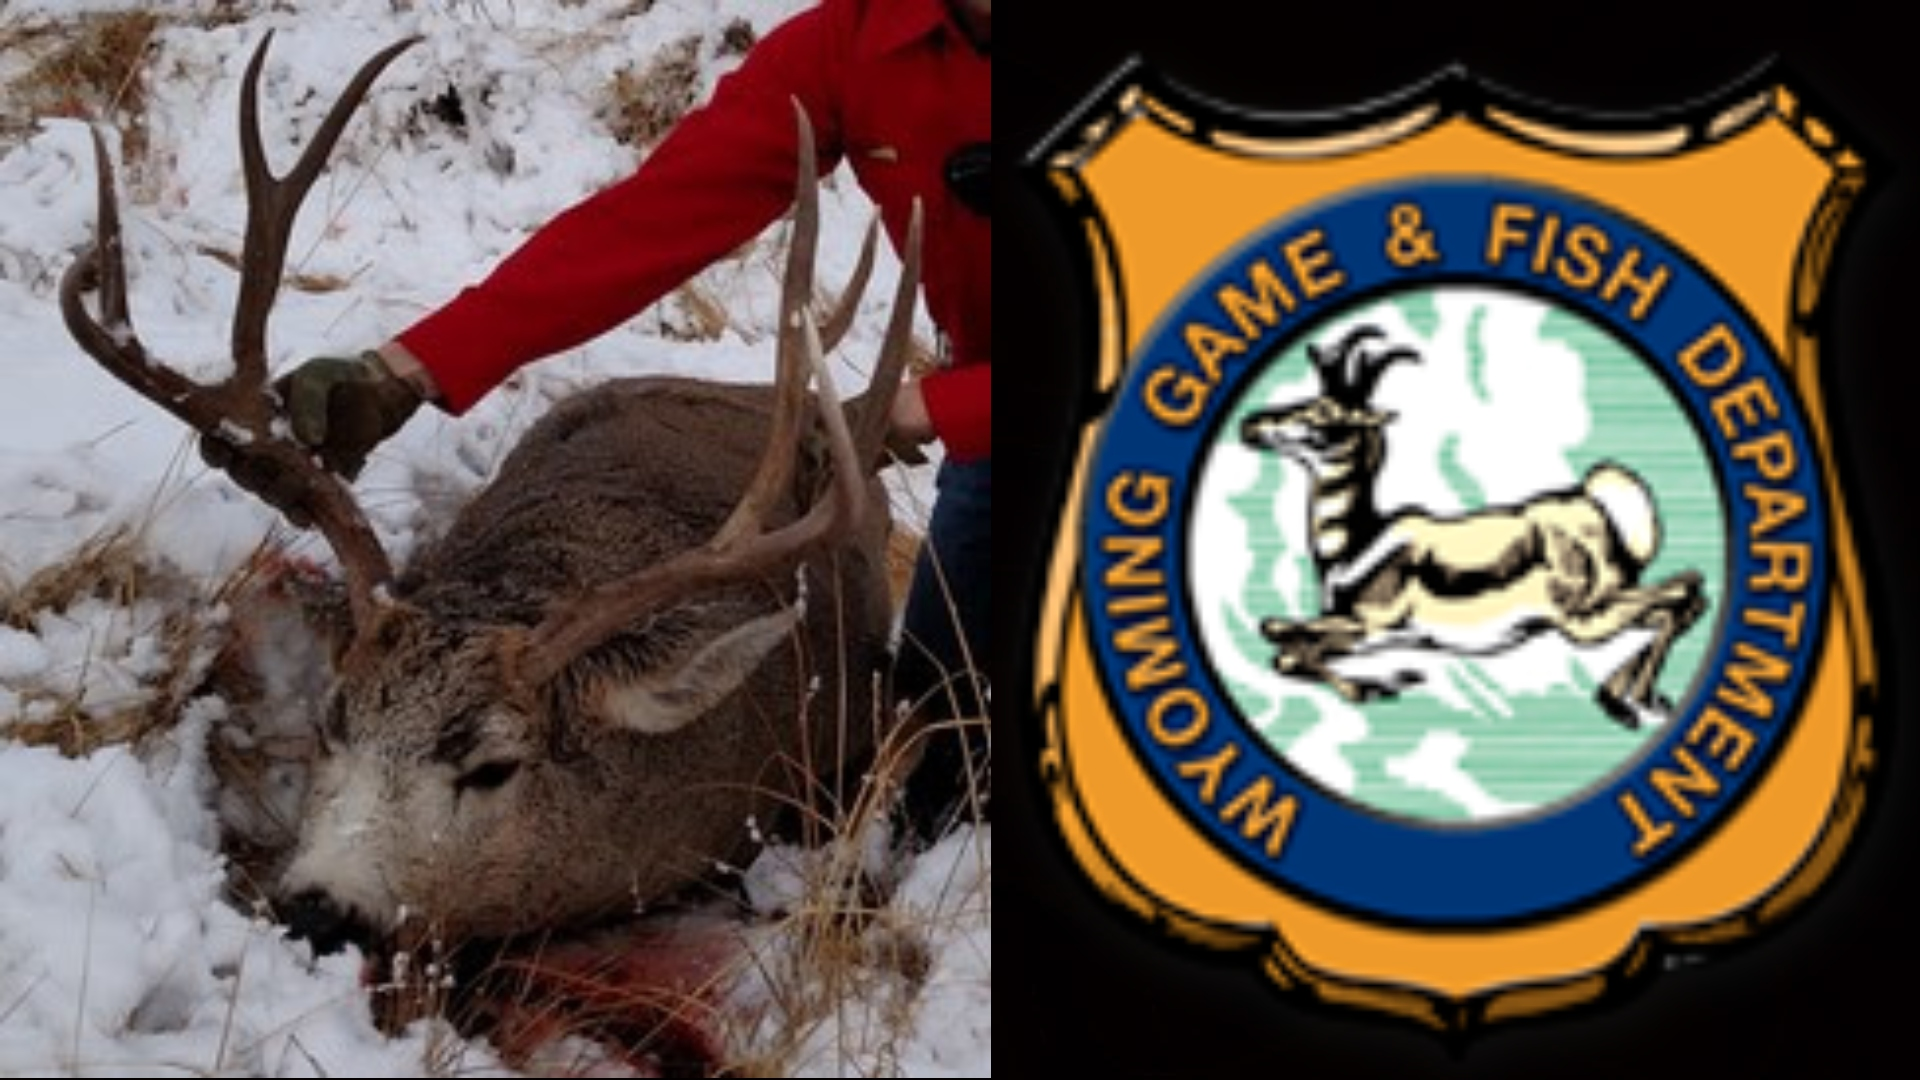 South Dakota residents plead guilty in 2017 Wyoming poaching case